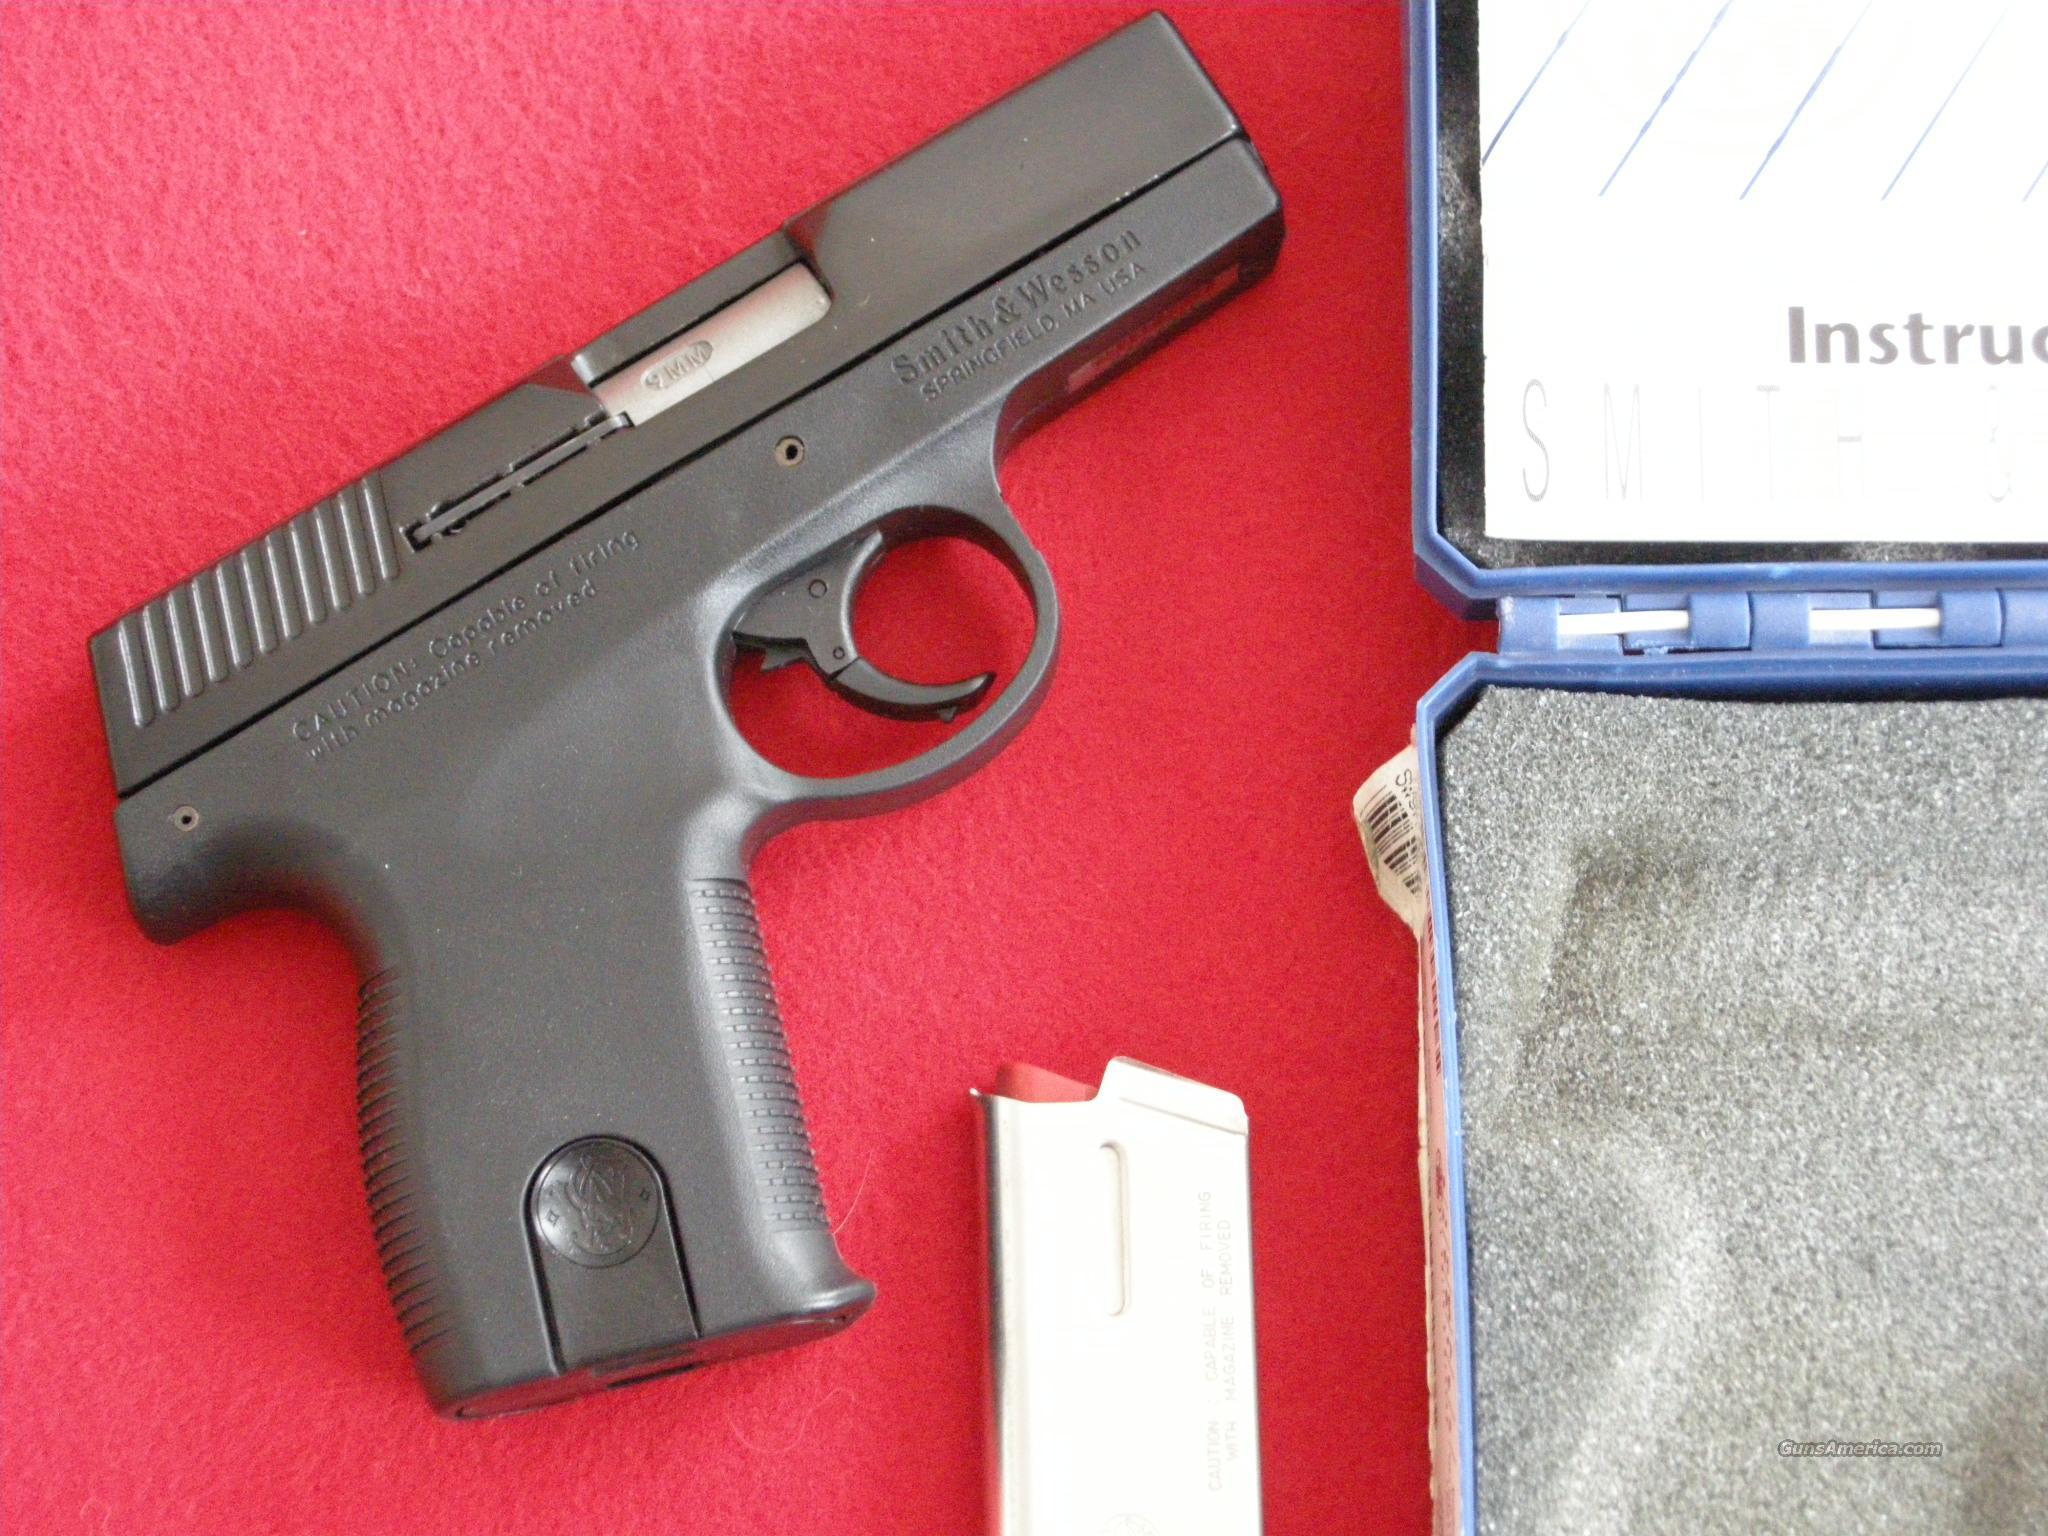 Smith & Wesson Sigma model SW9M  Guns > Pistols > Smith & Wesson Pistols - Autos > Polymer Frame